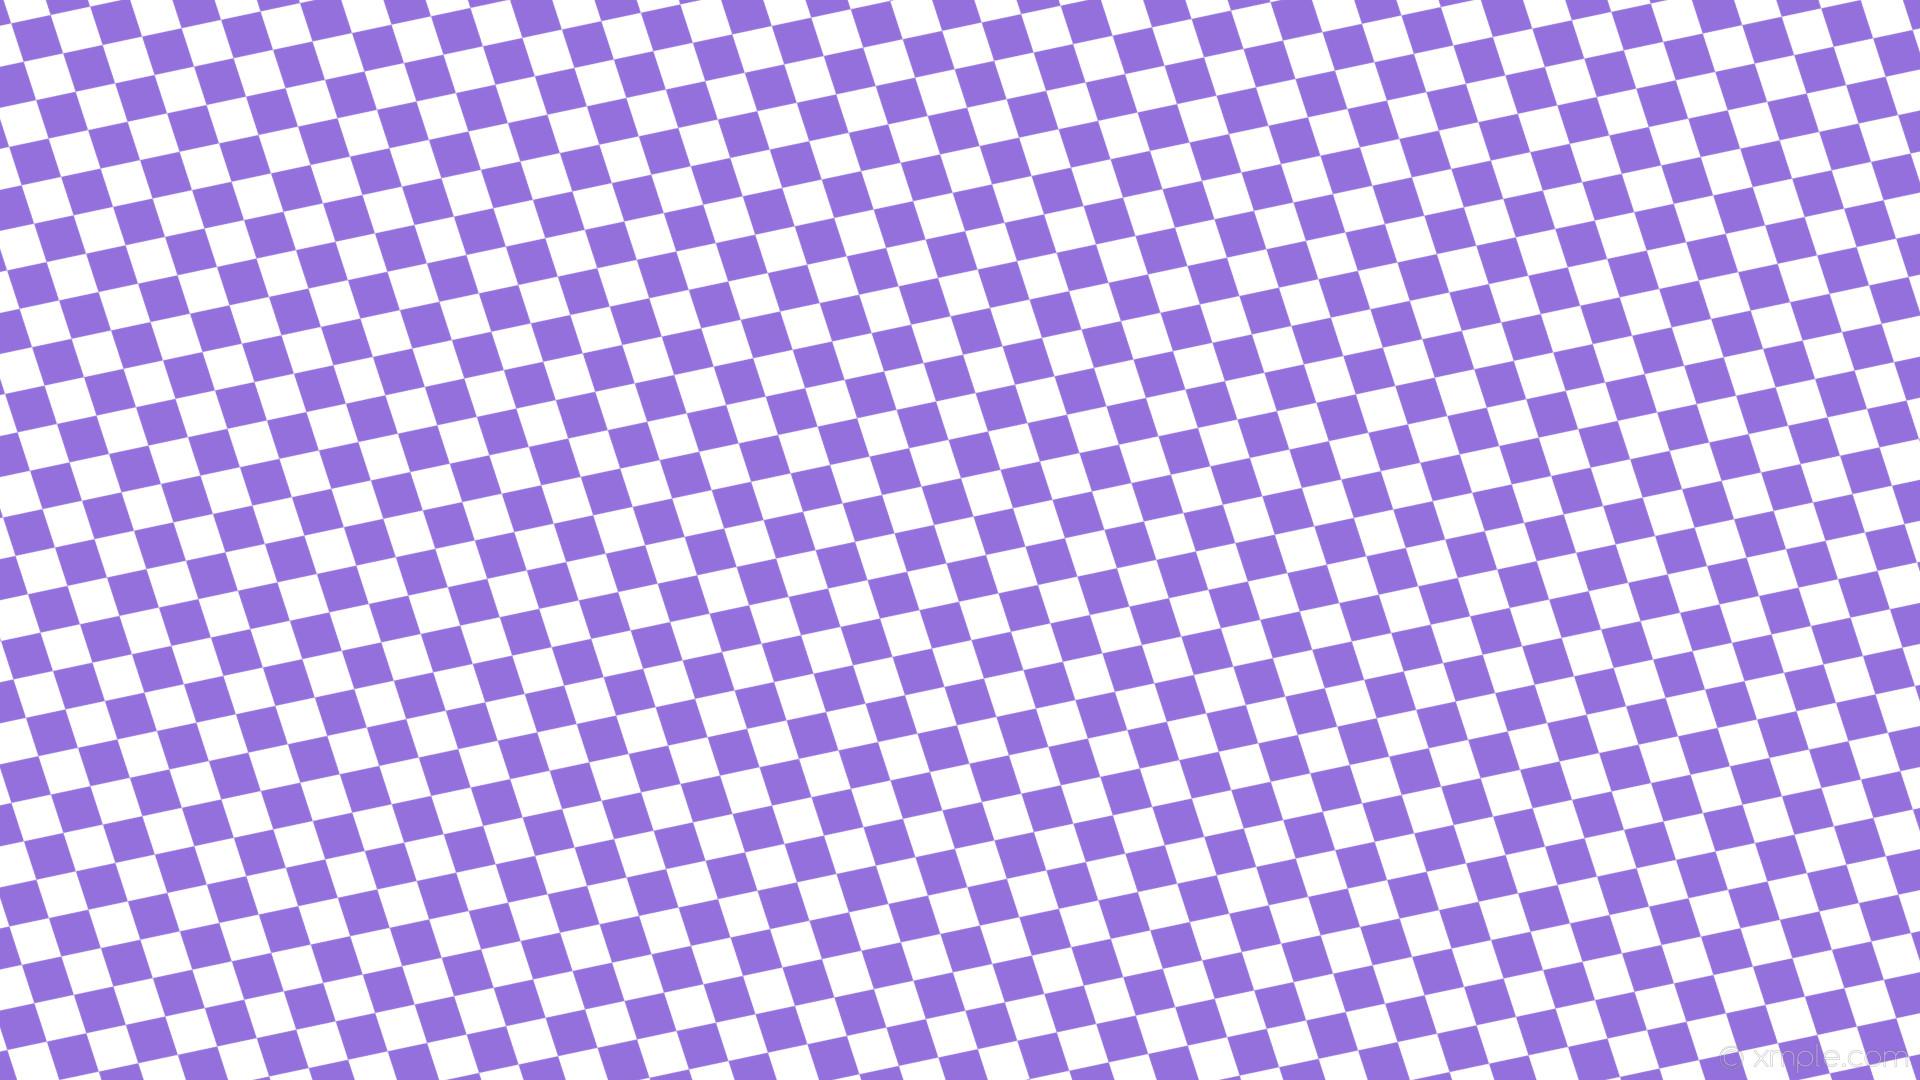 wallpaper purple diamond white lozenge rhombus medium purple #ffffff  #9370db 150° 60px 54px